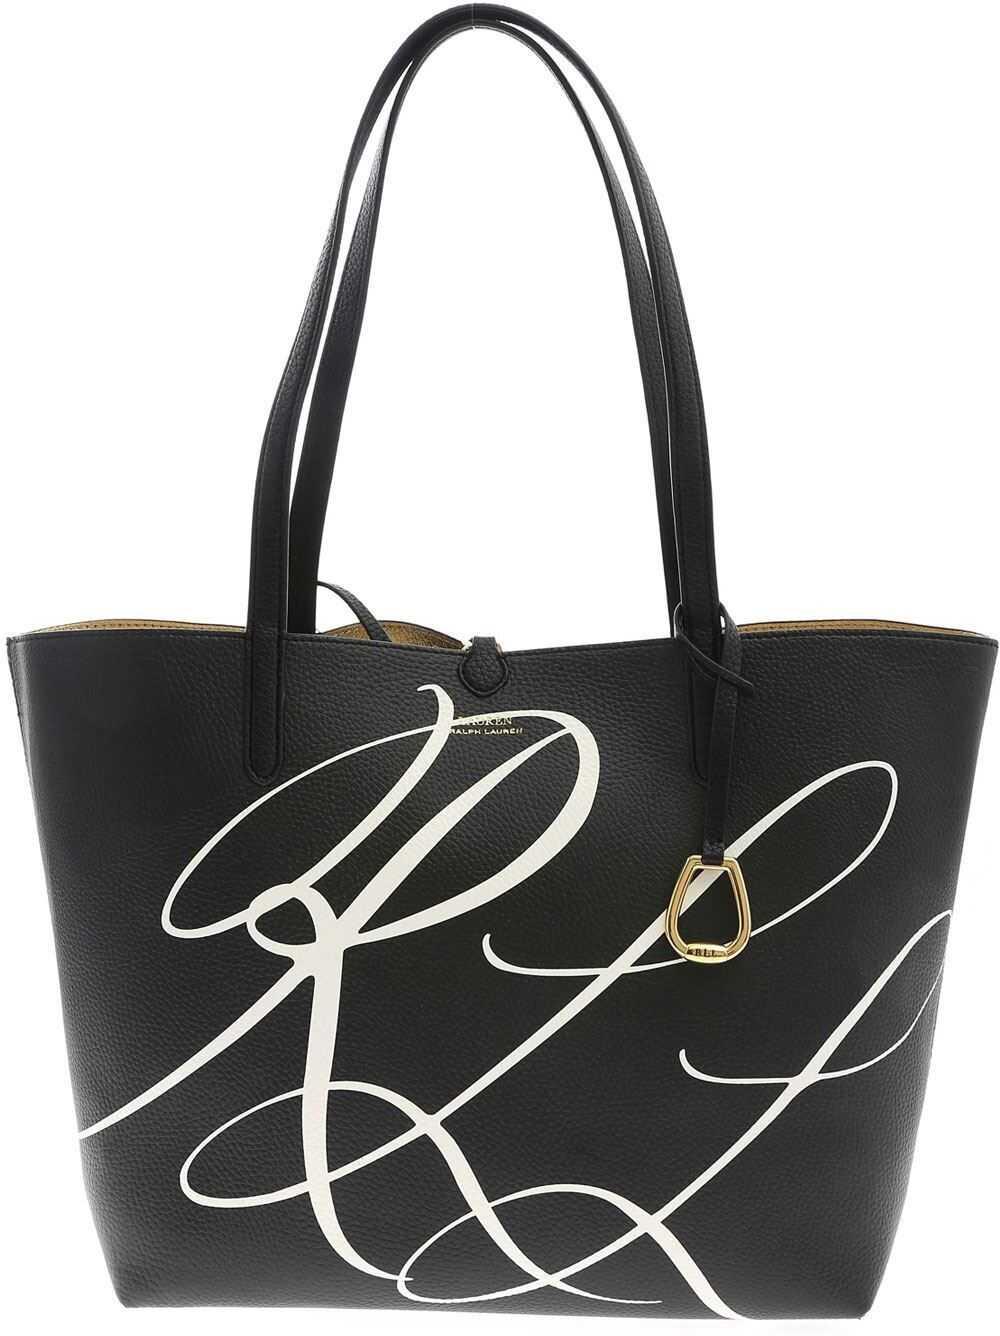 Ralph Lauren Reversible Tote Bag In Black And Gold Color 431795329022 Black imagine b-mall.ro